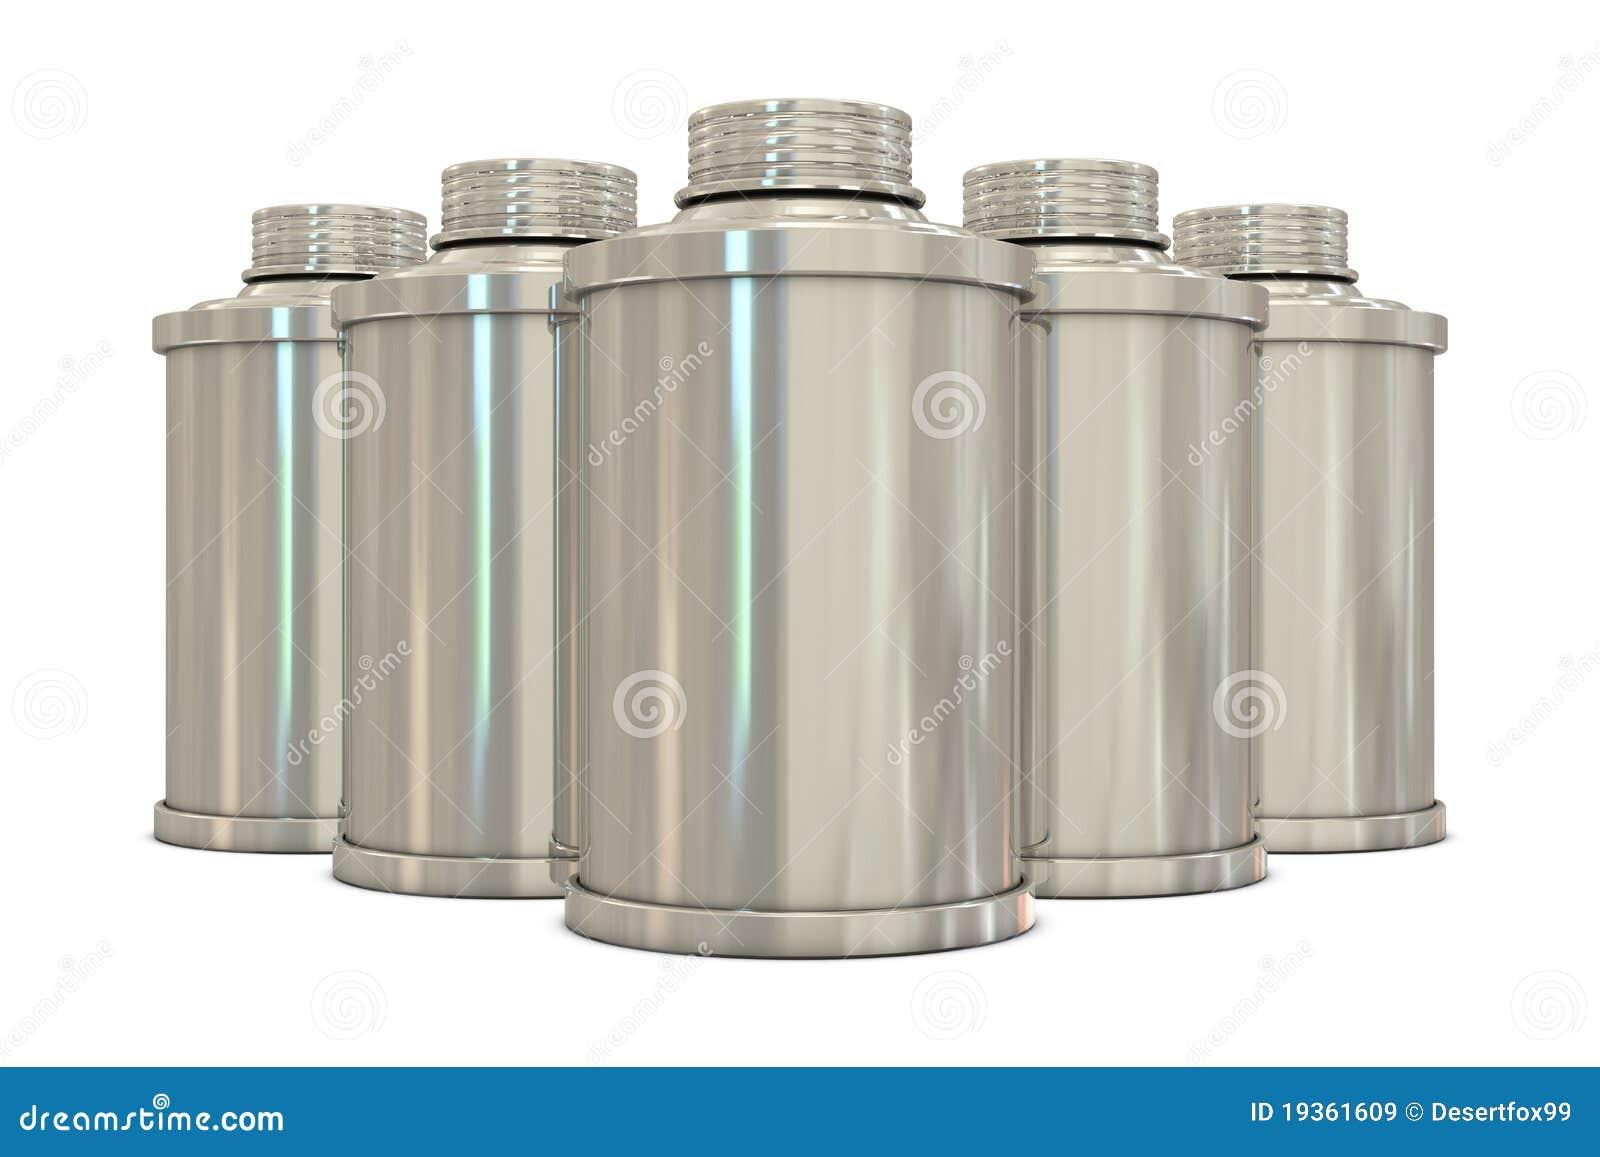 Latas de pulverizador de prata no grupo